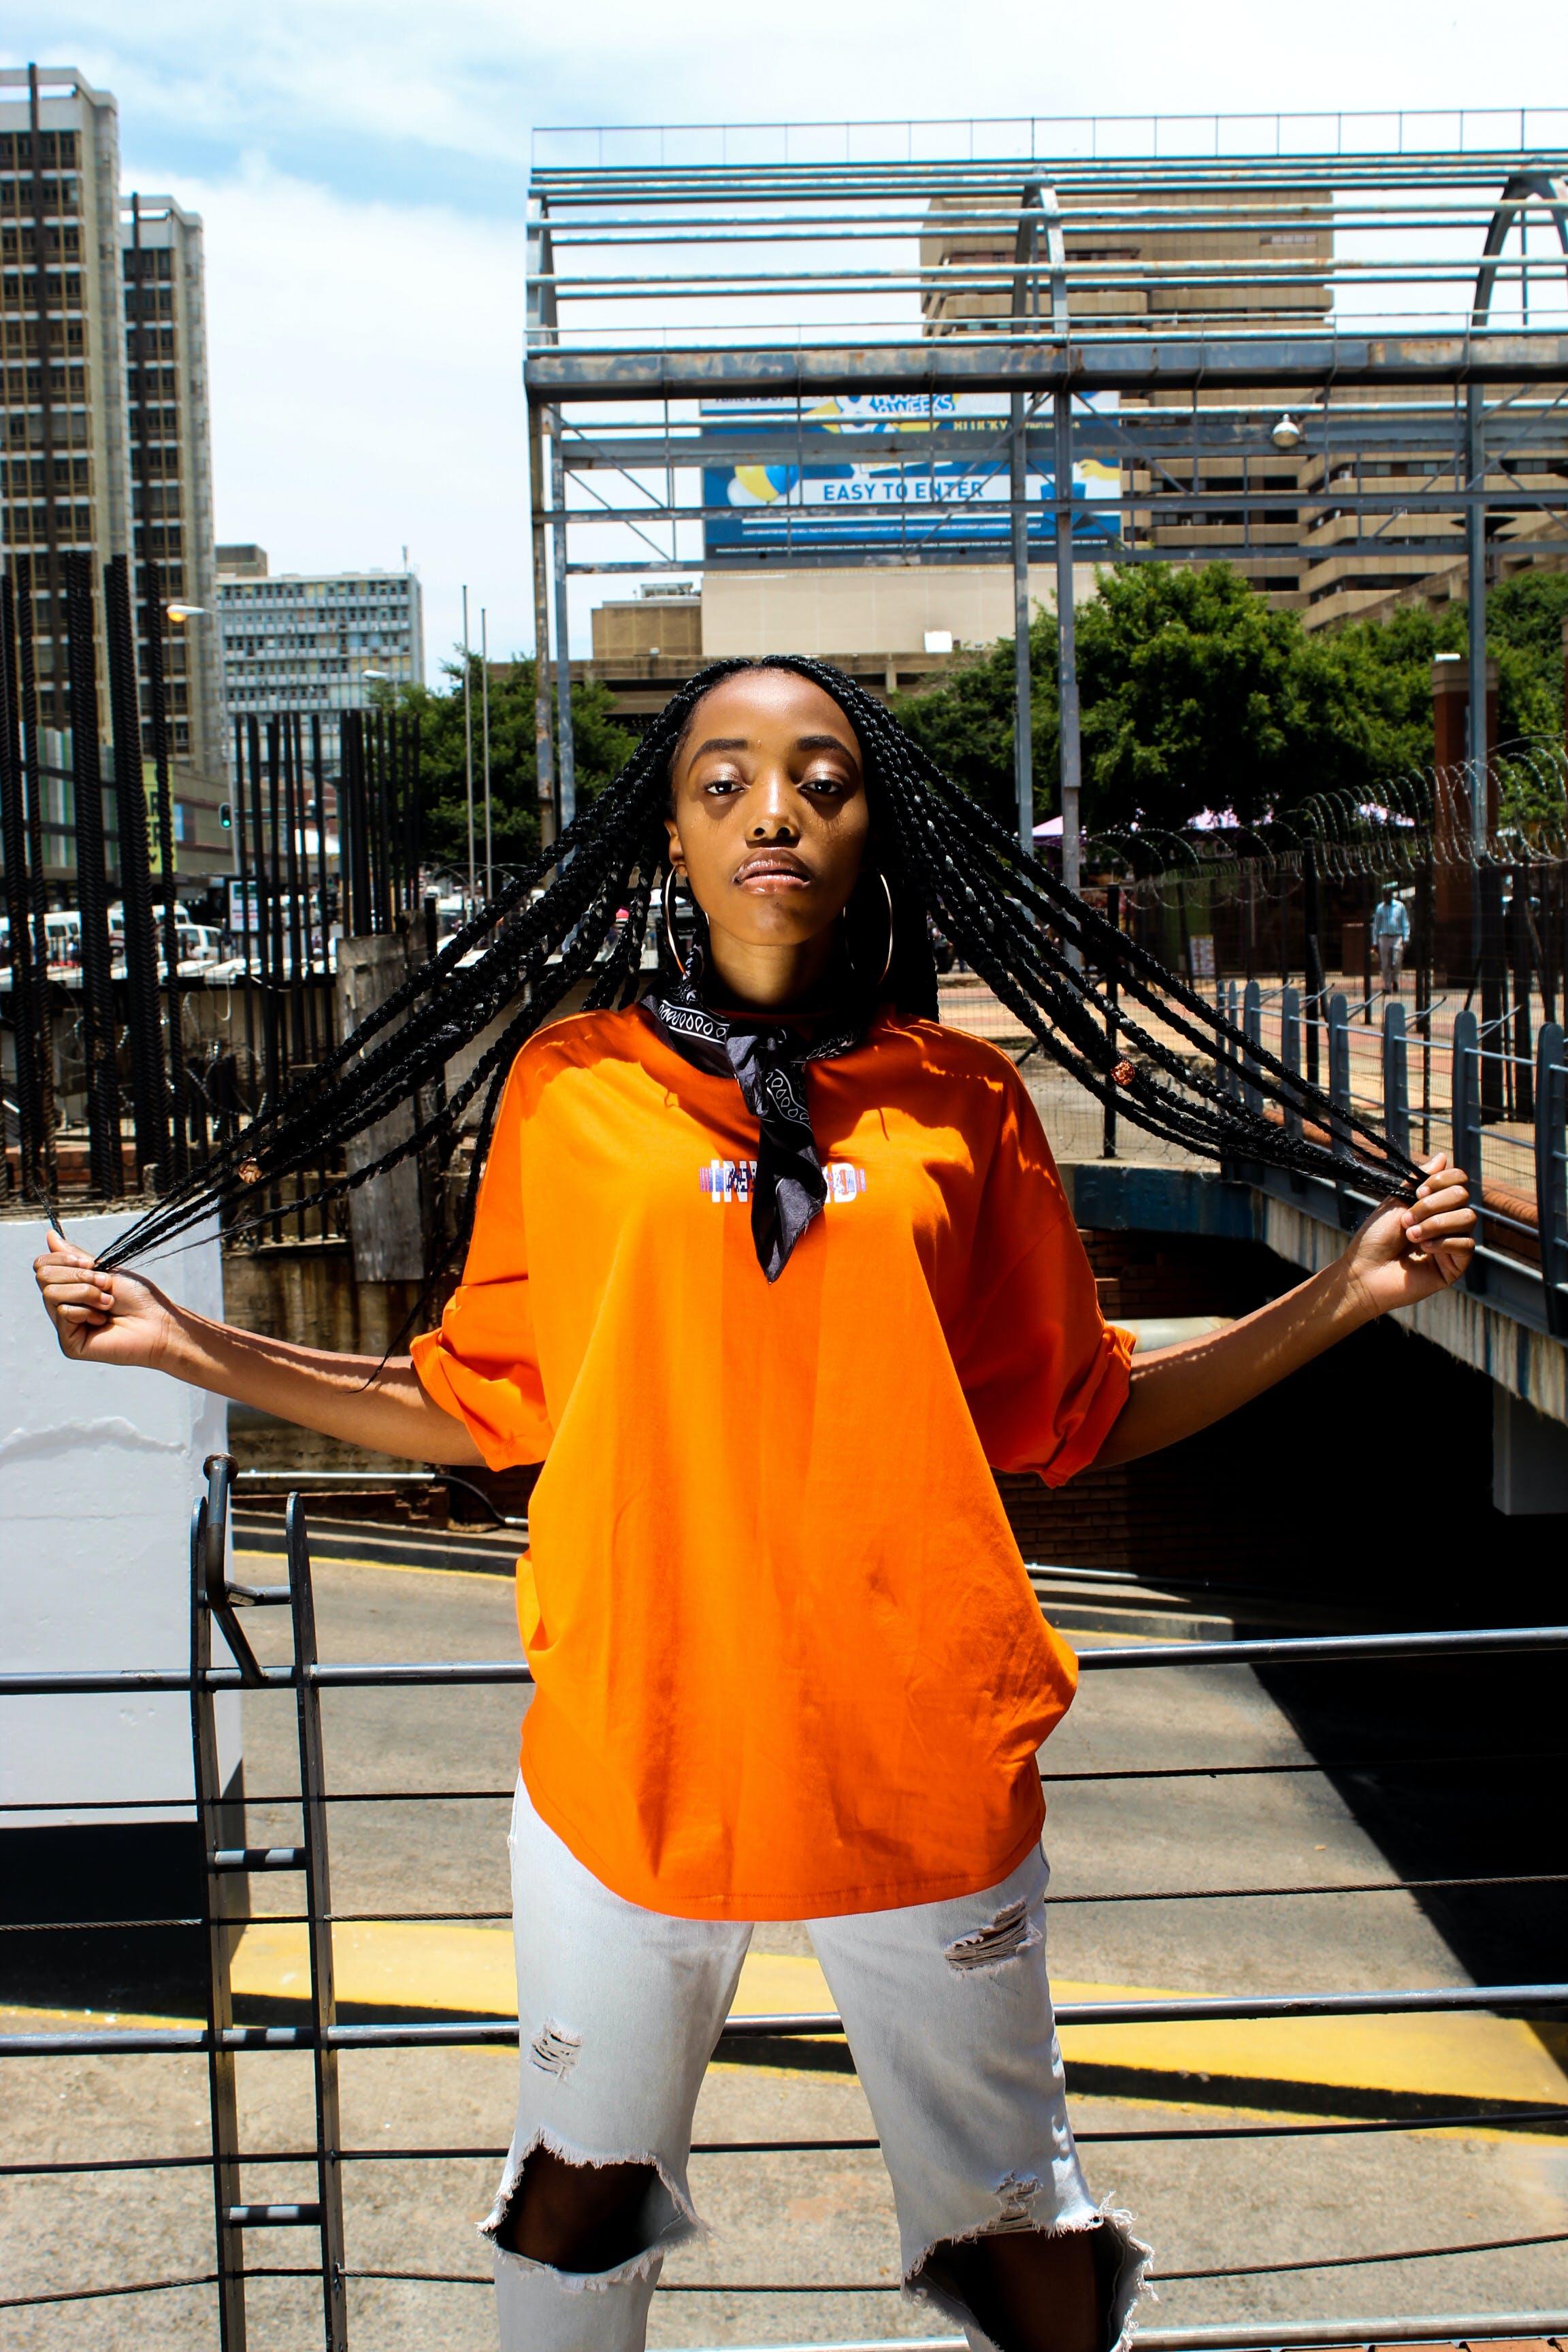 Fotos de stock gratuitas de actitud, adulto, afroamericano, bandana